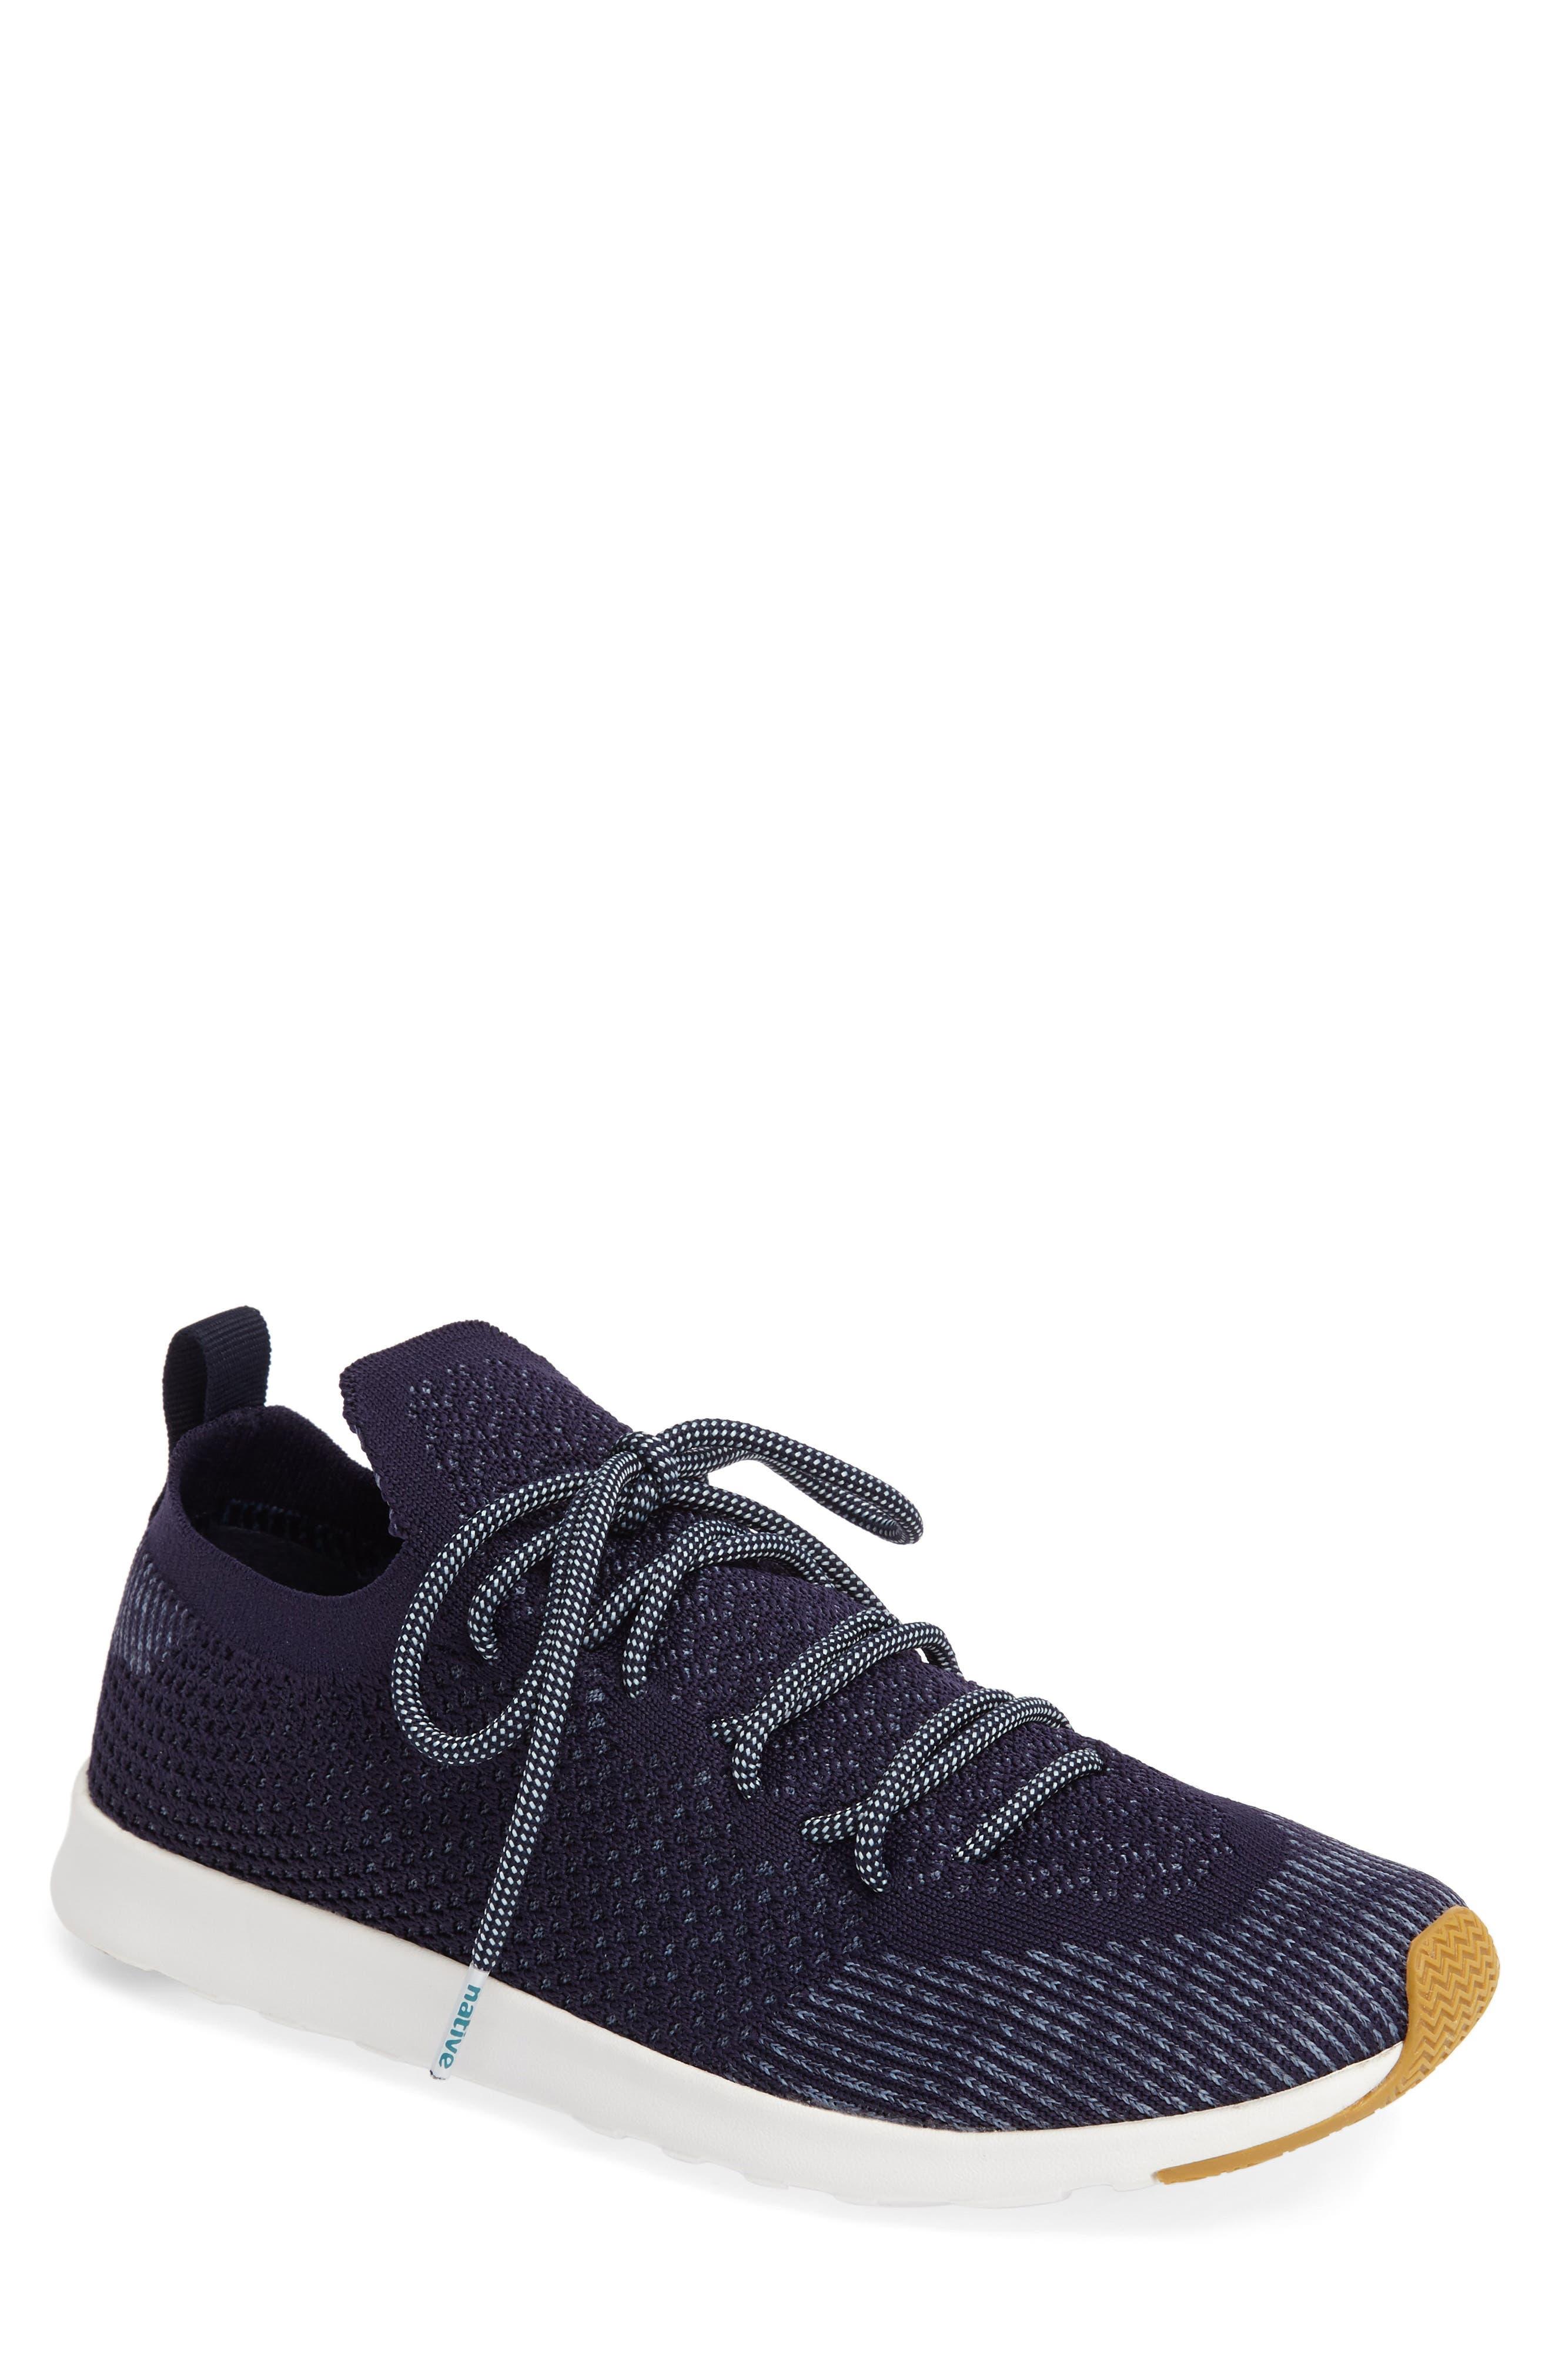 Alternate Image 1 Selected - Native Shoes AP Mercury Liteknit™ Sneaker